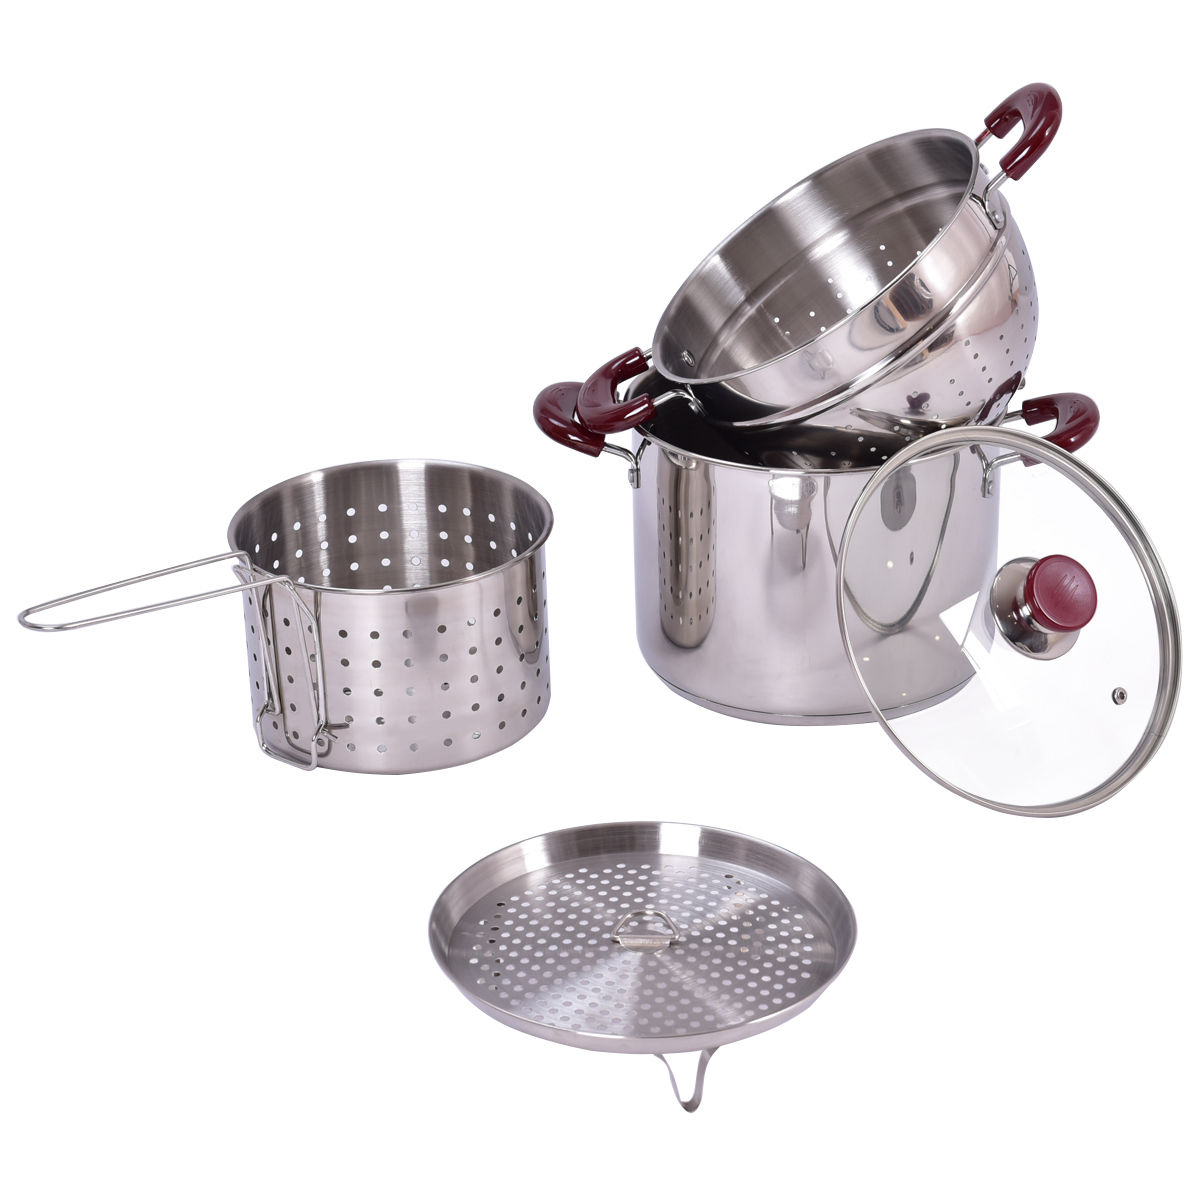 5 pcs Stainless Steel Stock Pot 7-Quart Pasta Cooker Set